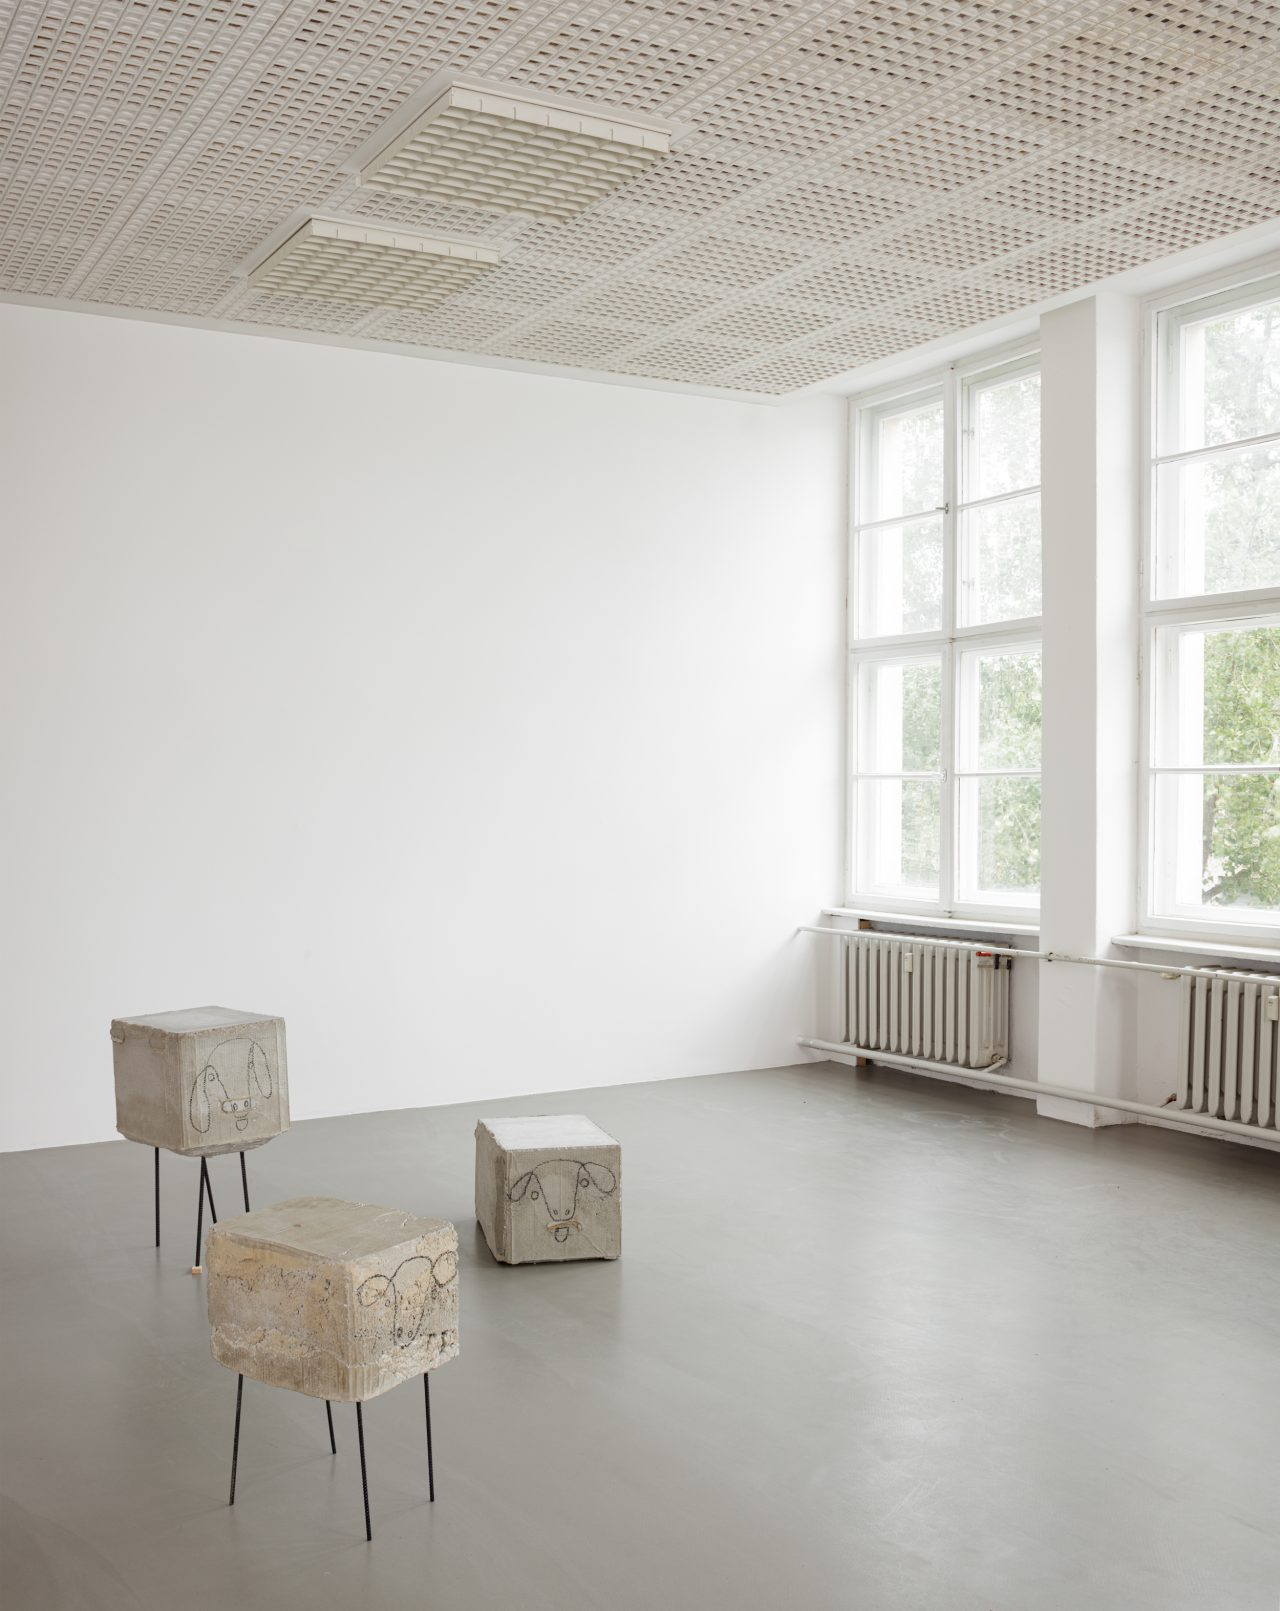 Judith Hopf, untitled (Schafherde) (2013 / 2021)